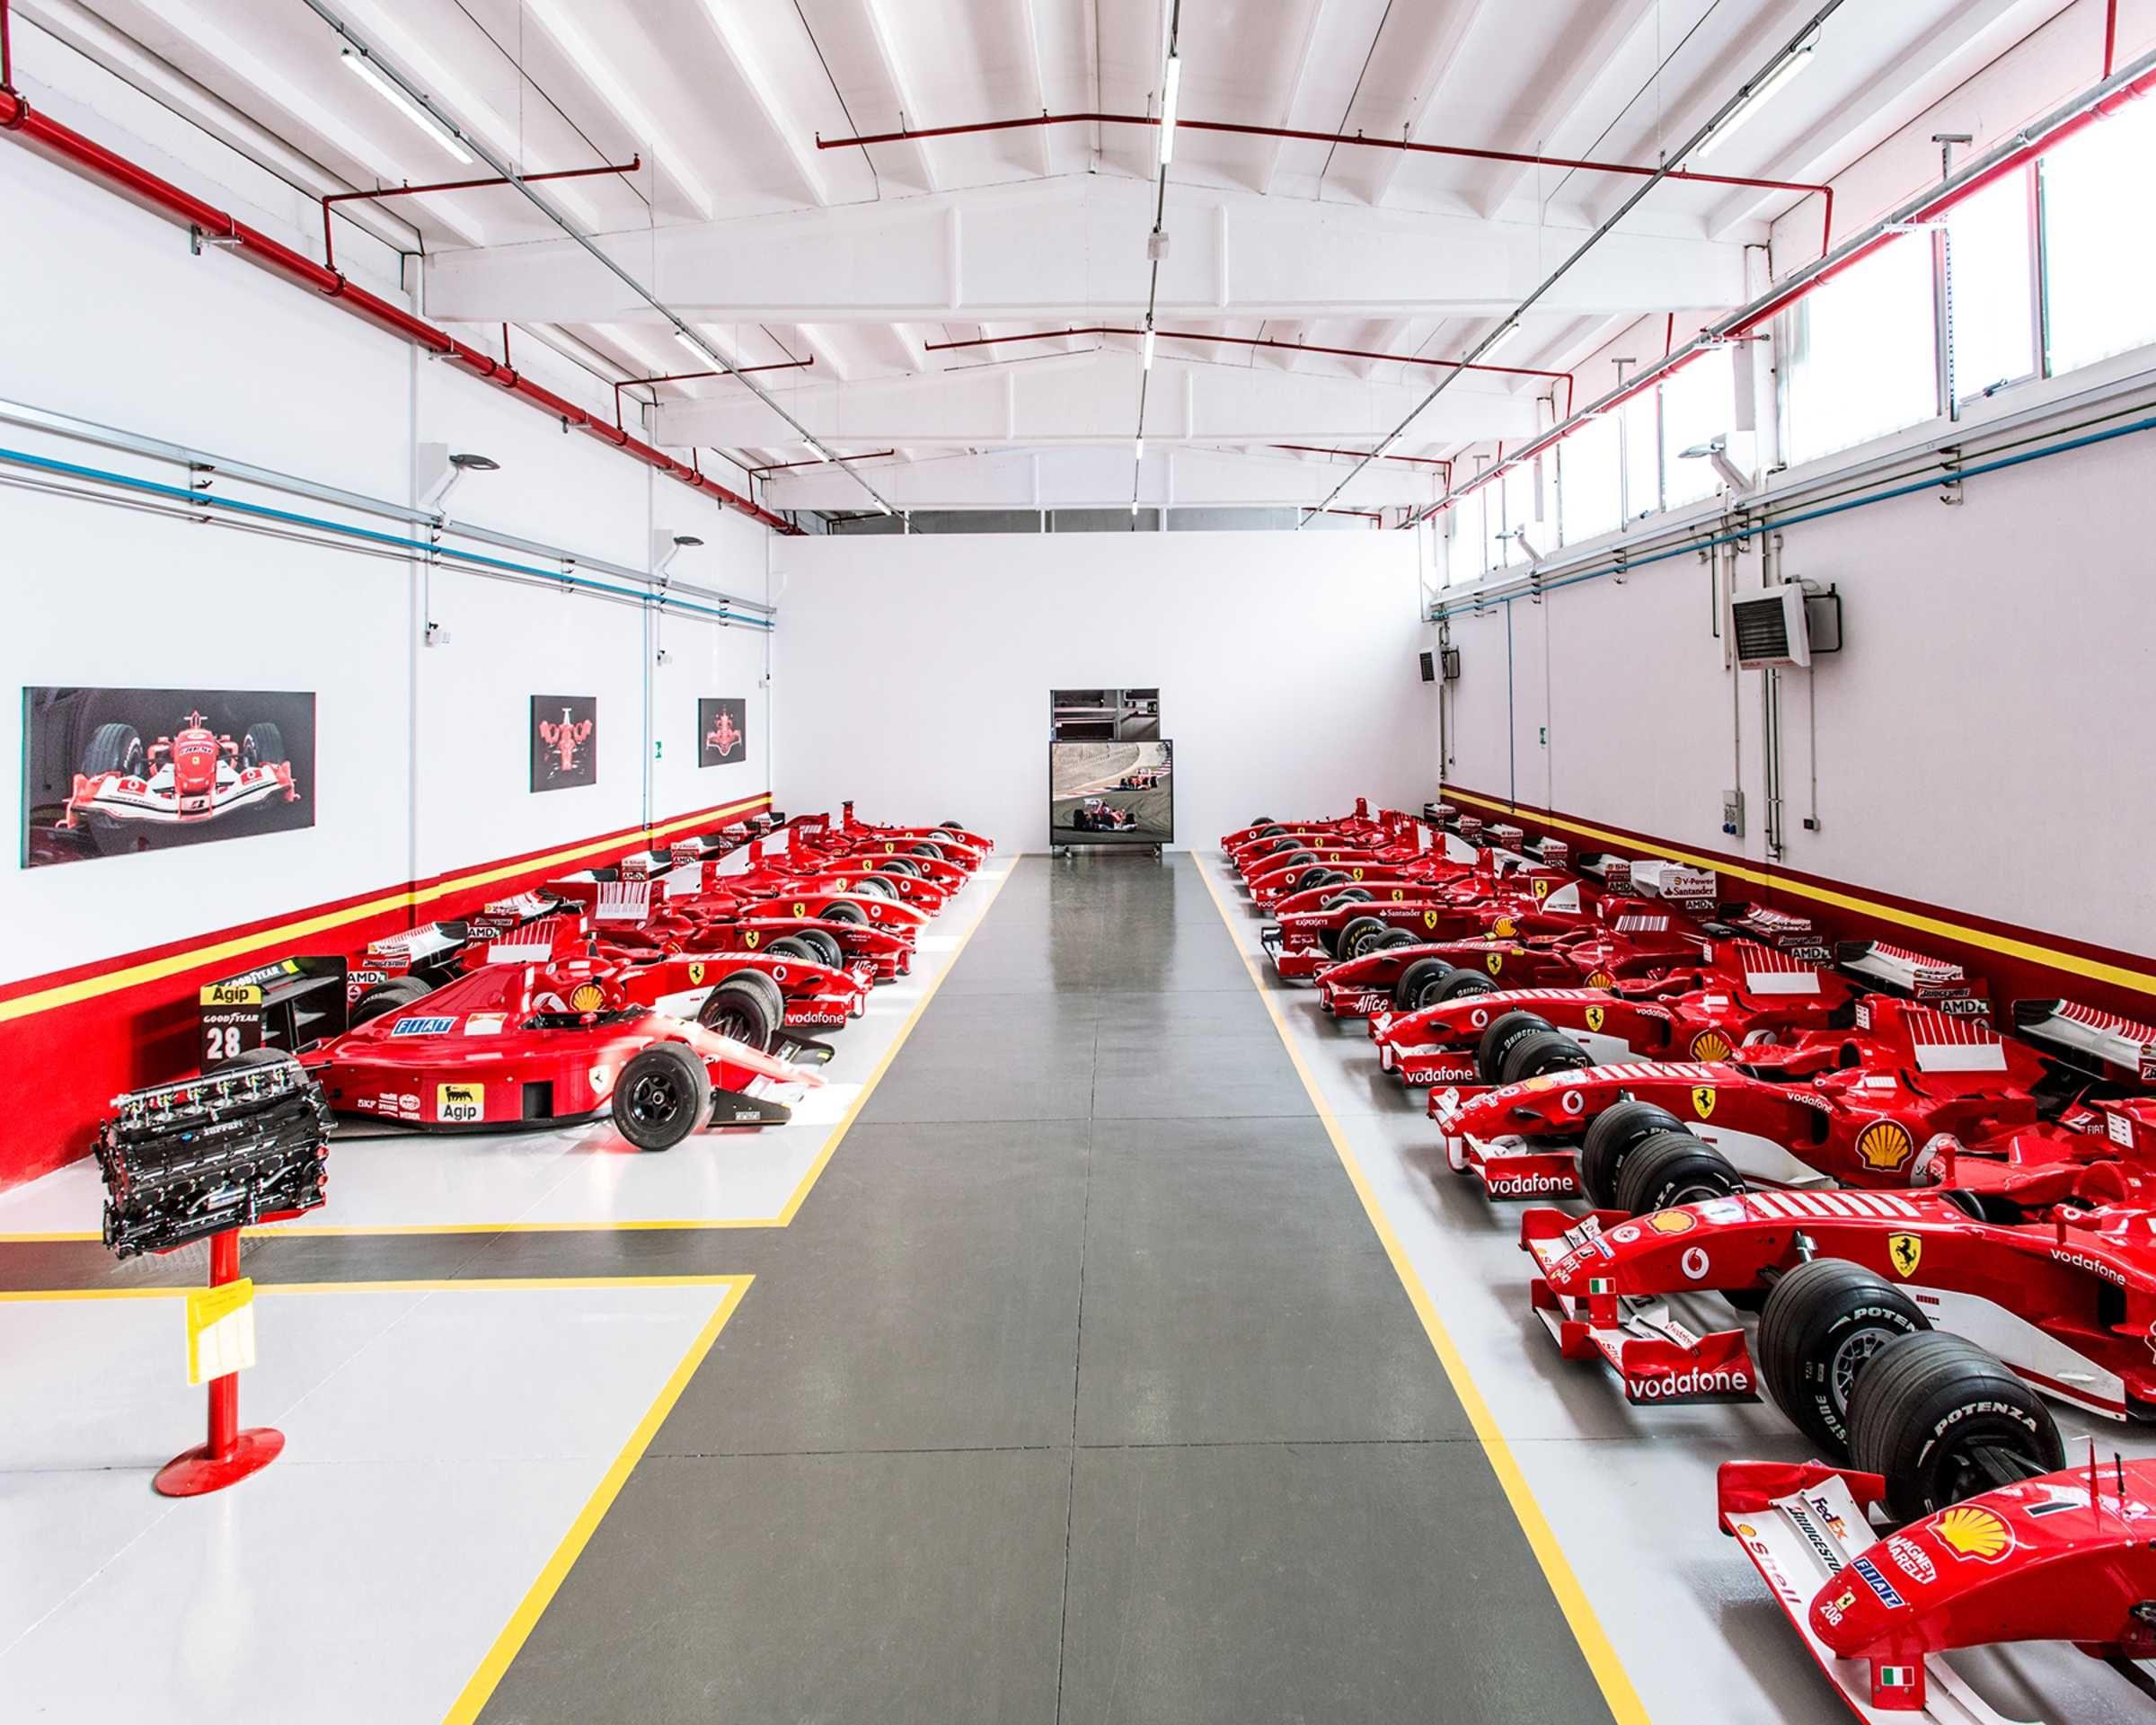 Photo Tour Of Ferrari S Factory In Maranello Italy Ferrari Luoghi